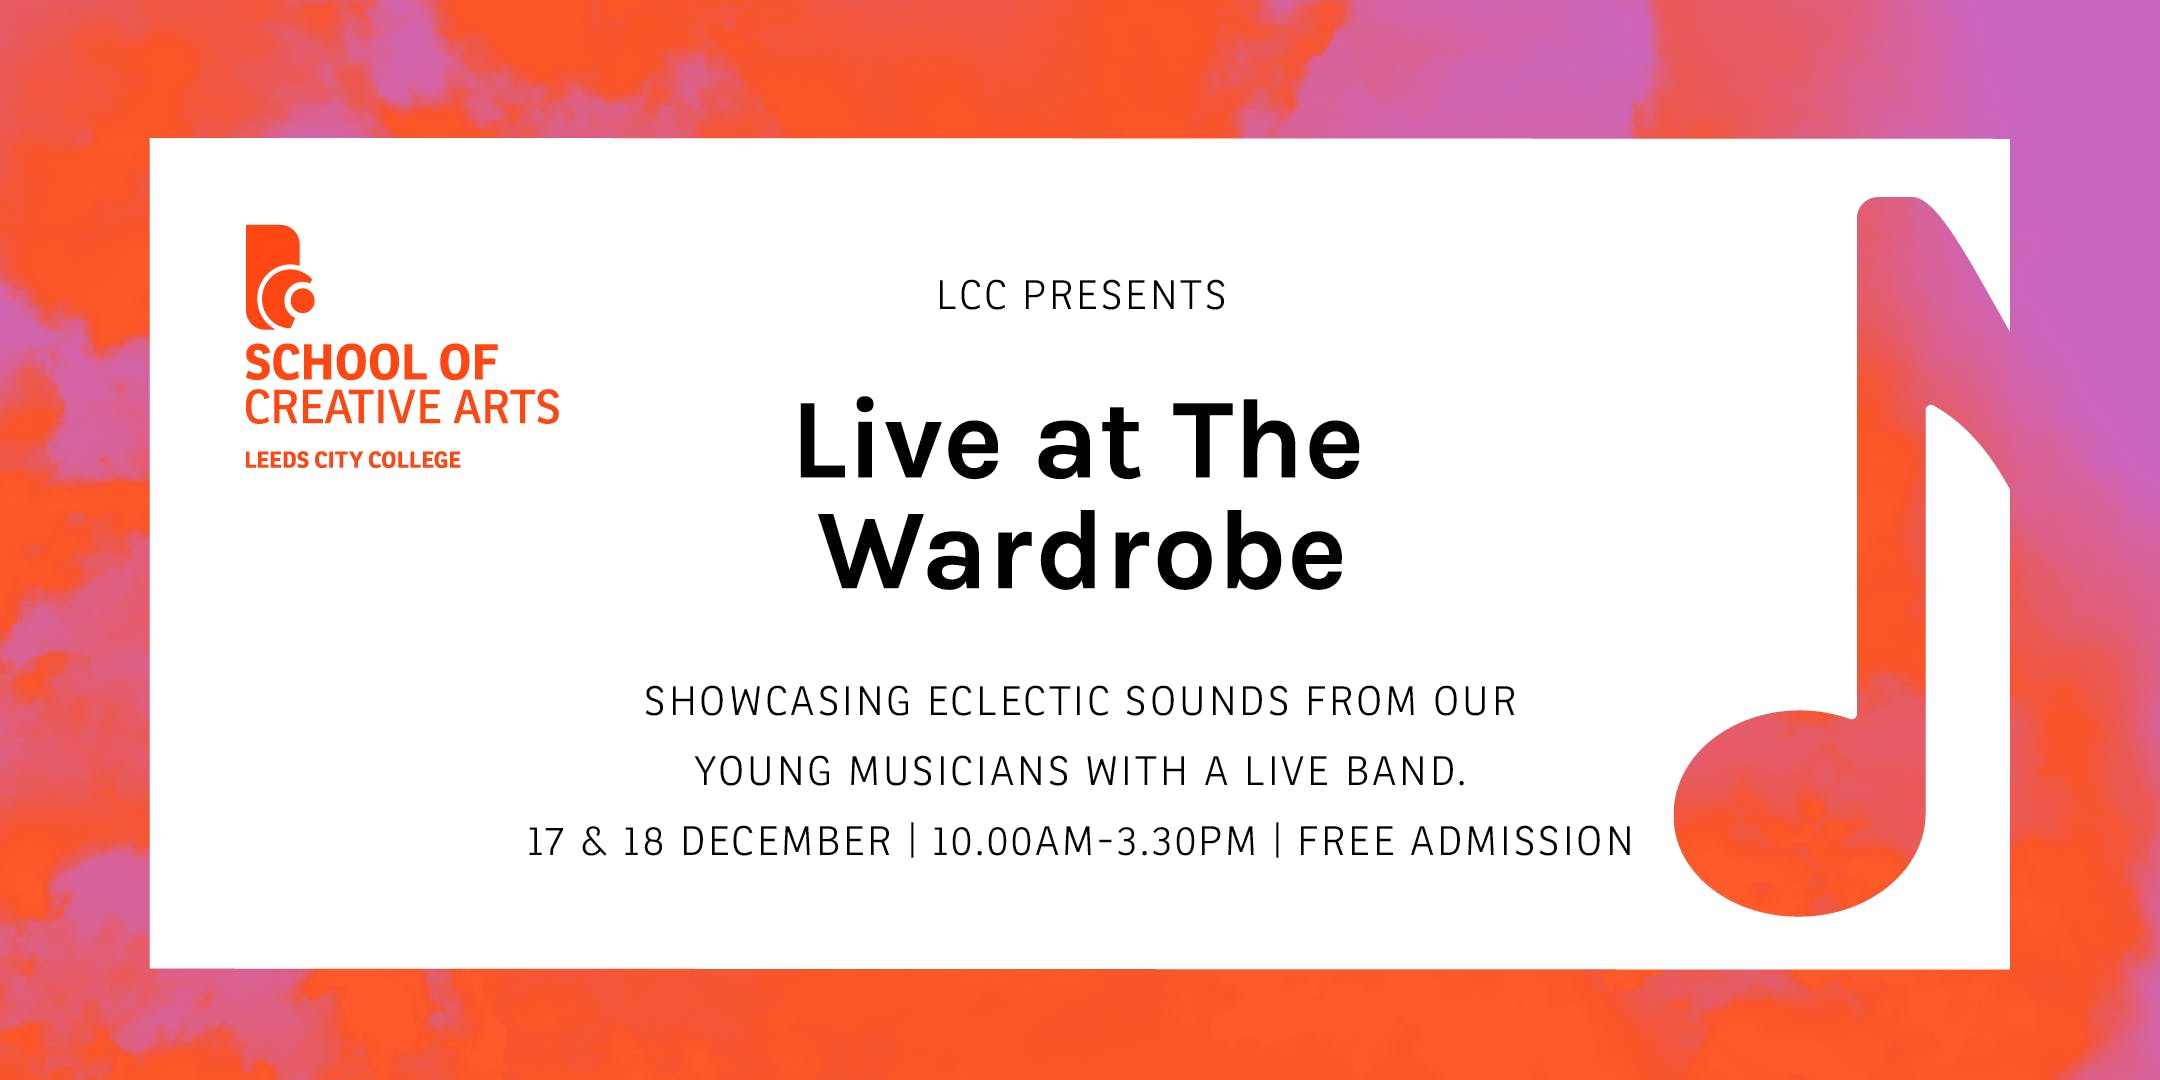 Live at The Wardrobe 17 & 18 Dec